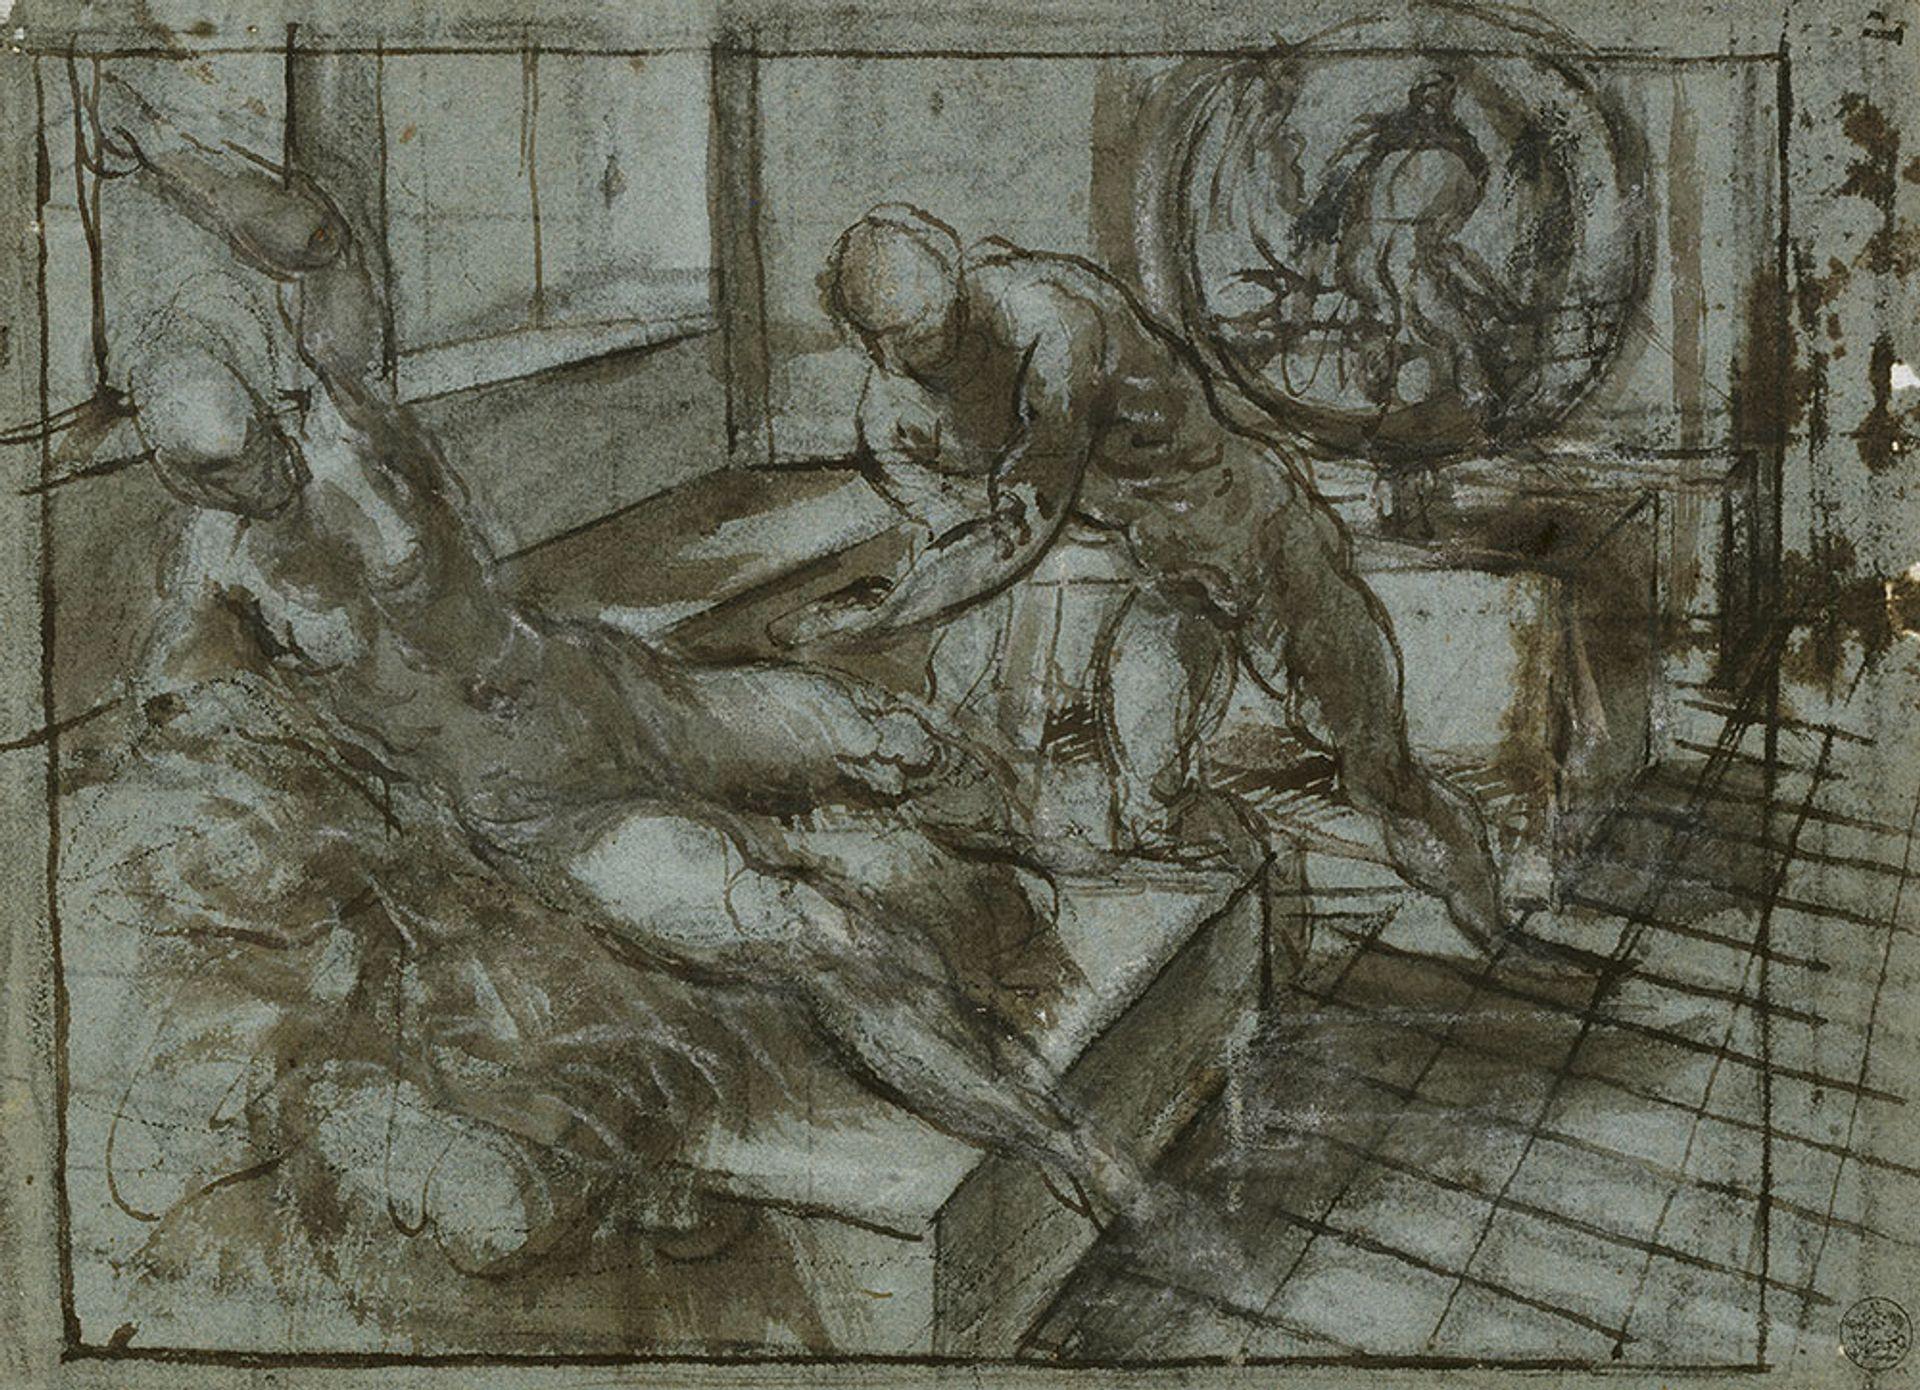 Tintoretto, Venus and Vulcan (around 1545), black chalk, pen and brown ink with brown and gray wash bpk Bildagentur / Kup- ferstichkabinett, Staatliche Museen zu Berlin /Art Resource, NY. Photography by Jorg P. Anders